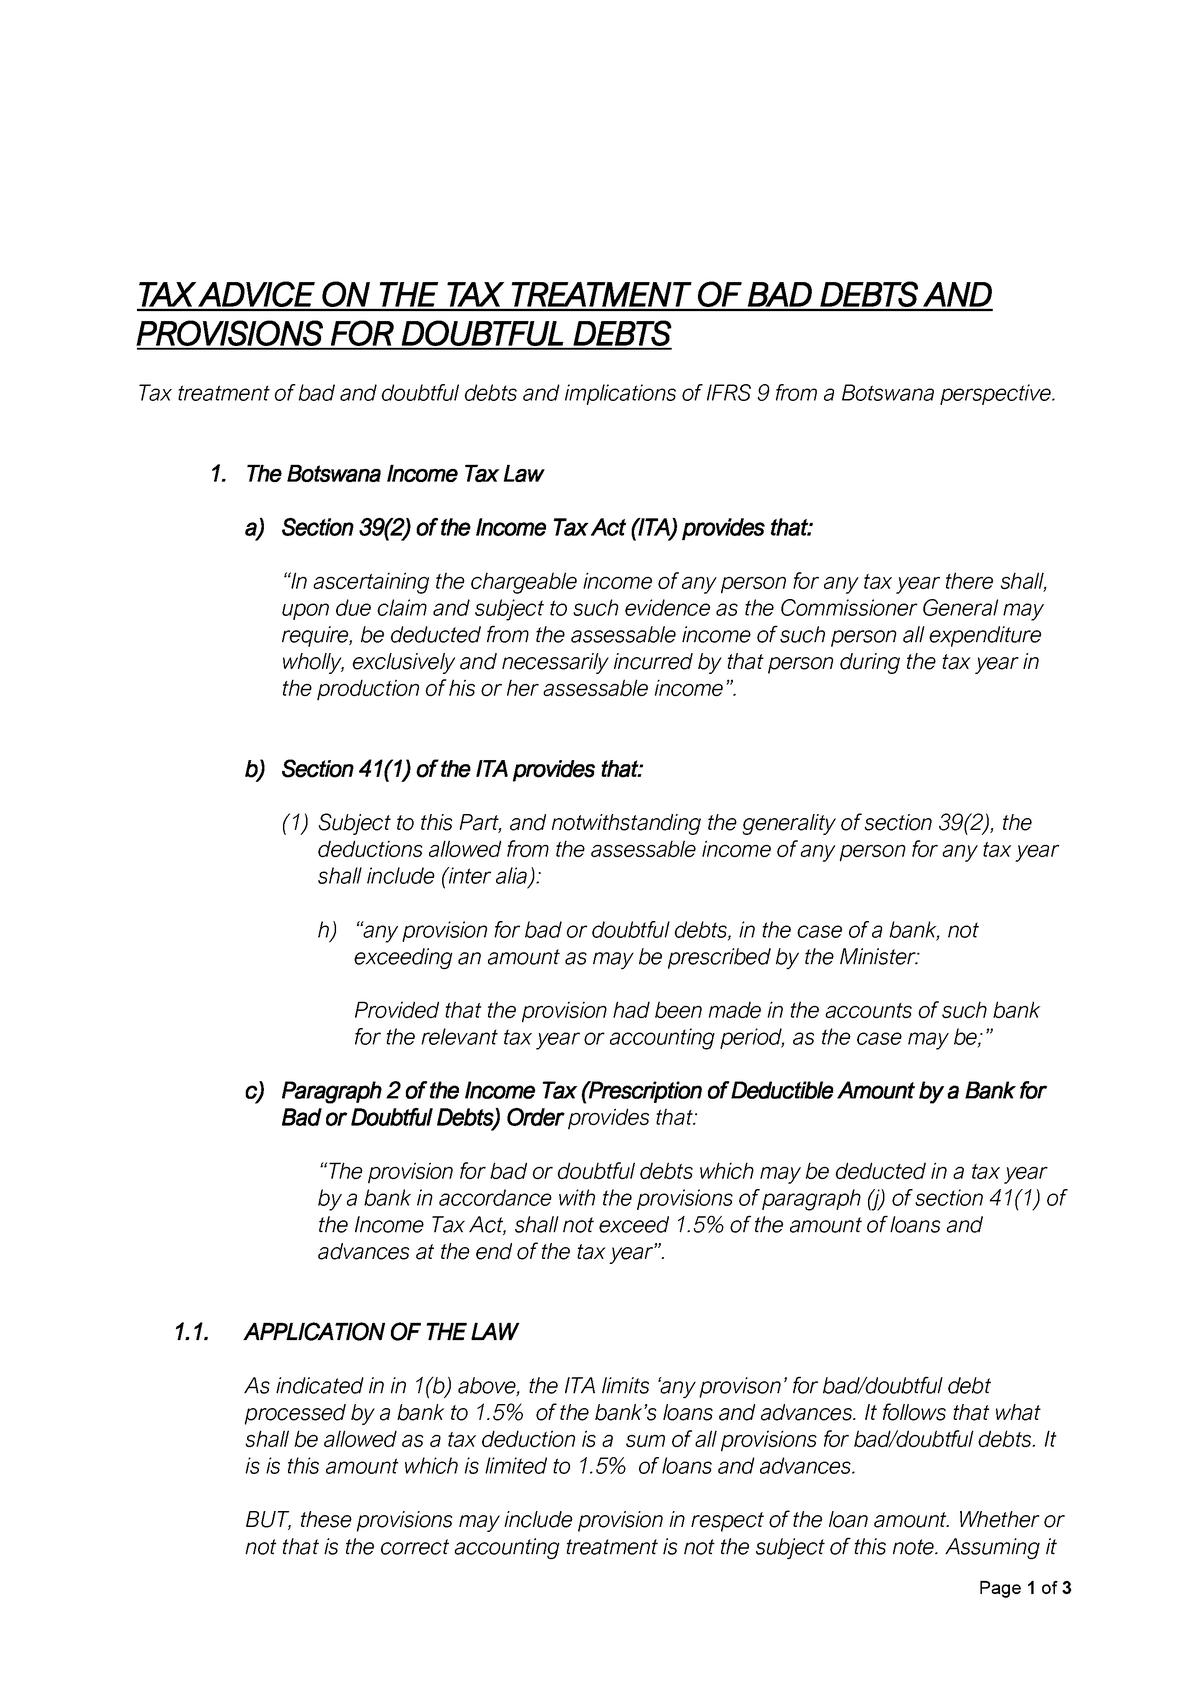 Ifrs 9 Vs Tax Botswana Macroeconomics Econ302 Uz Studocu